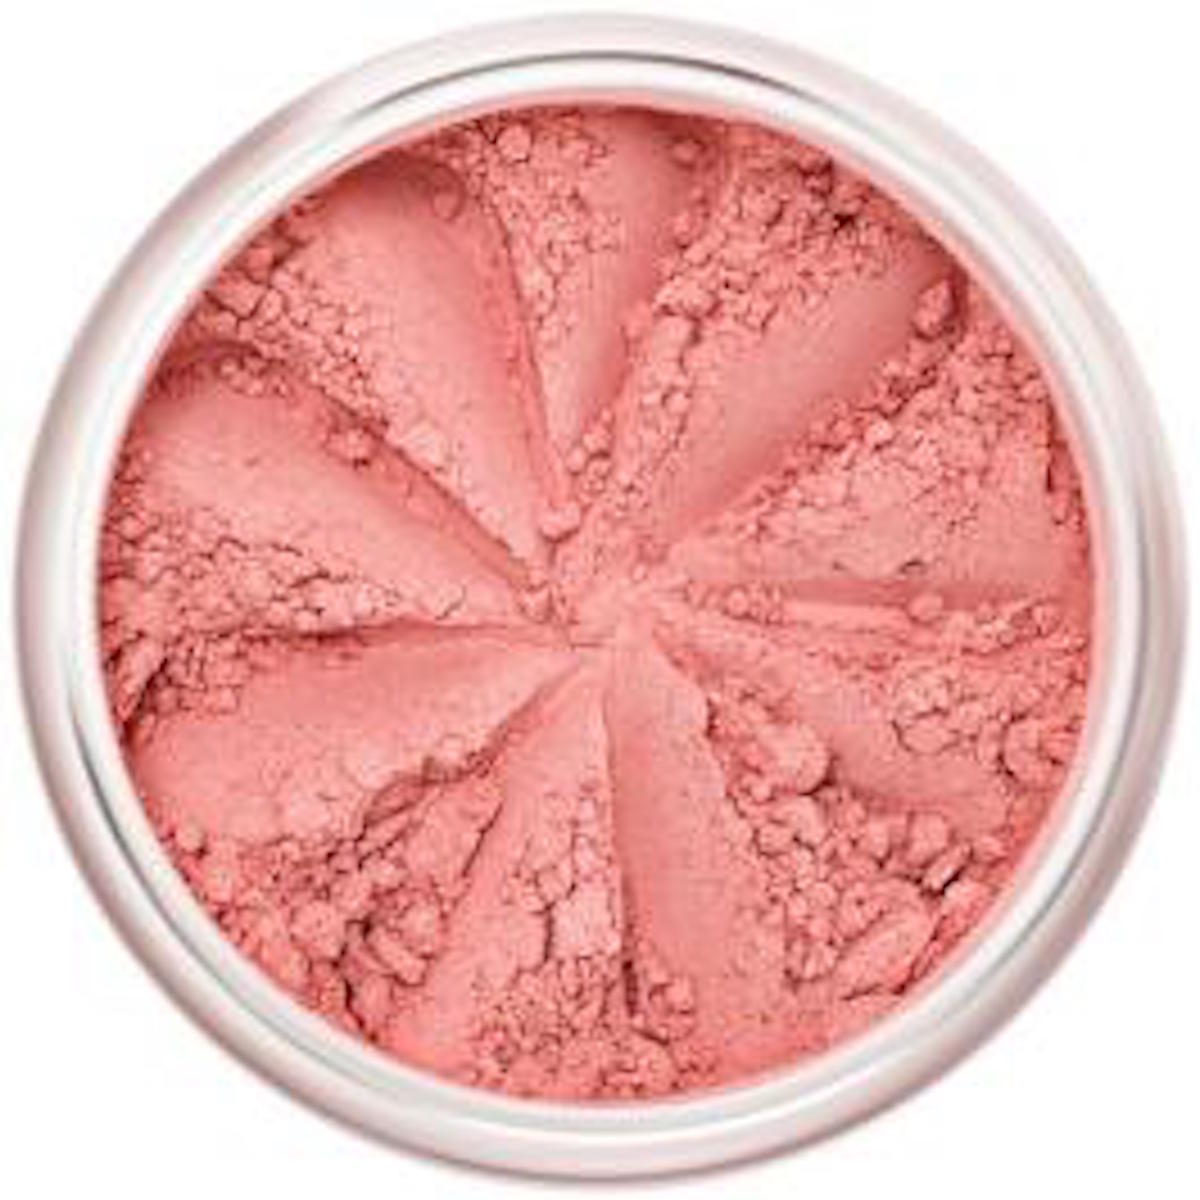 lily lolo koralna mineralno rdečilo beautyfull blog